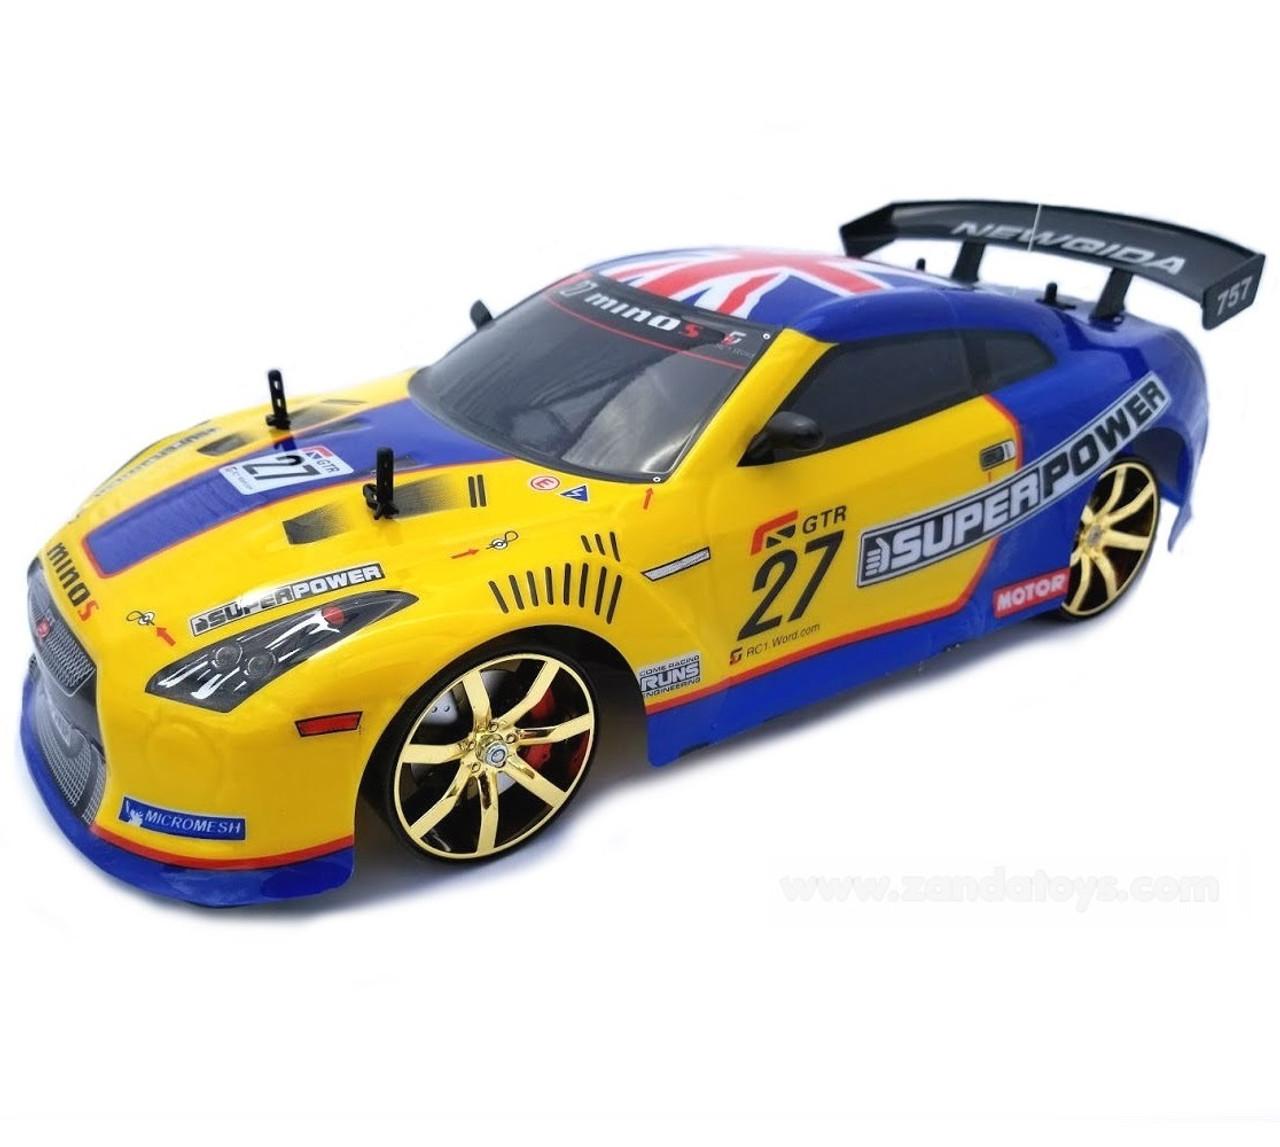 1/10 Nissan GTR Drift RC Car 4WD Electric Yellow & Blue - Zandatoys